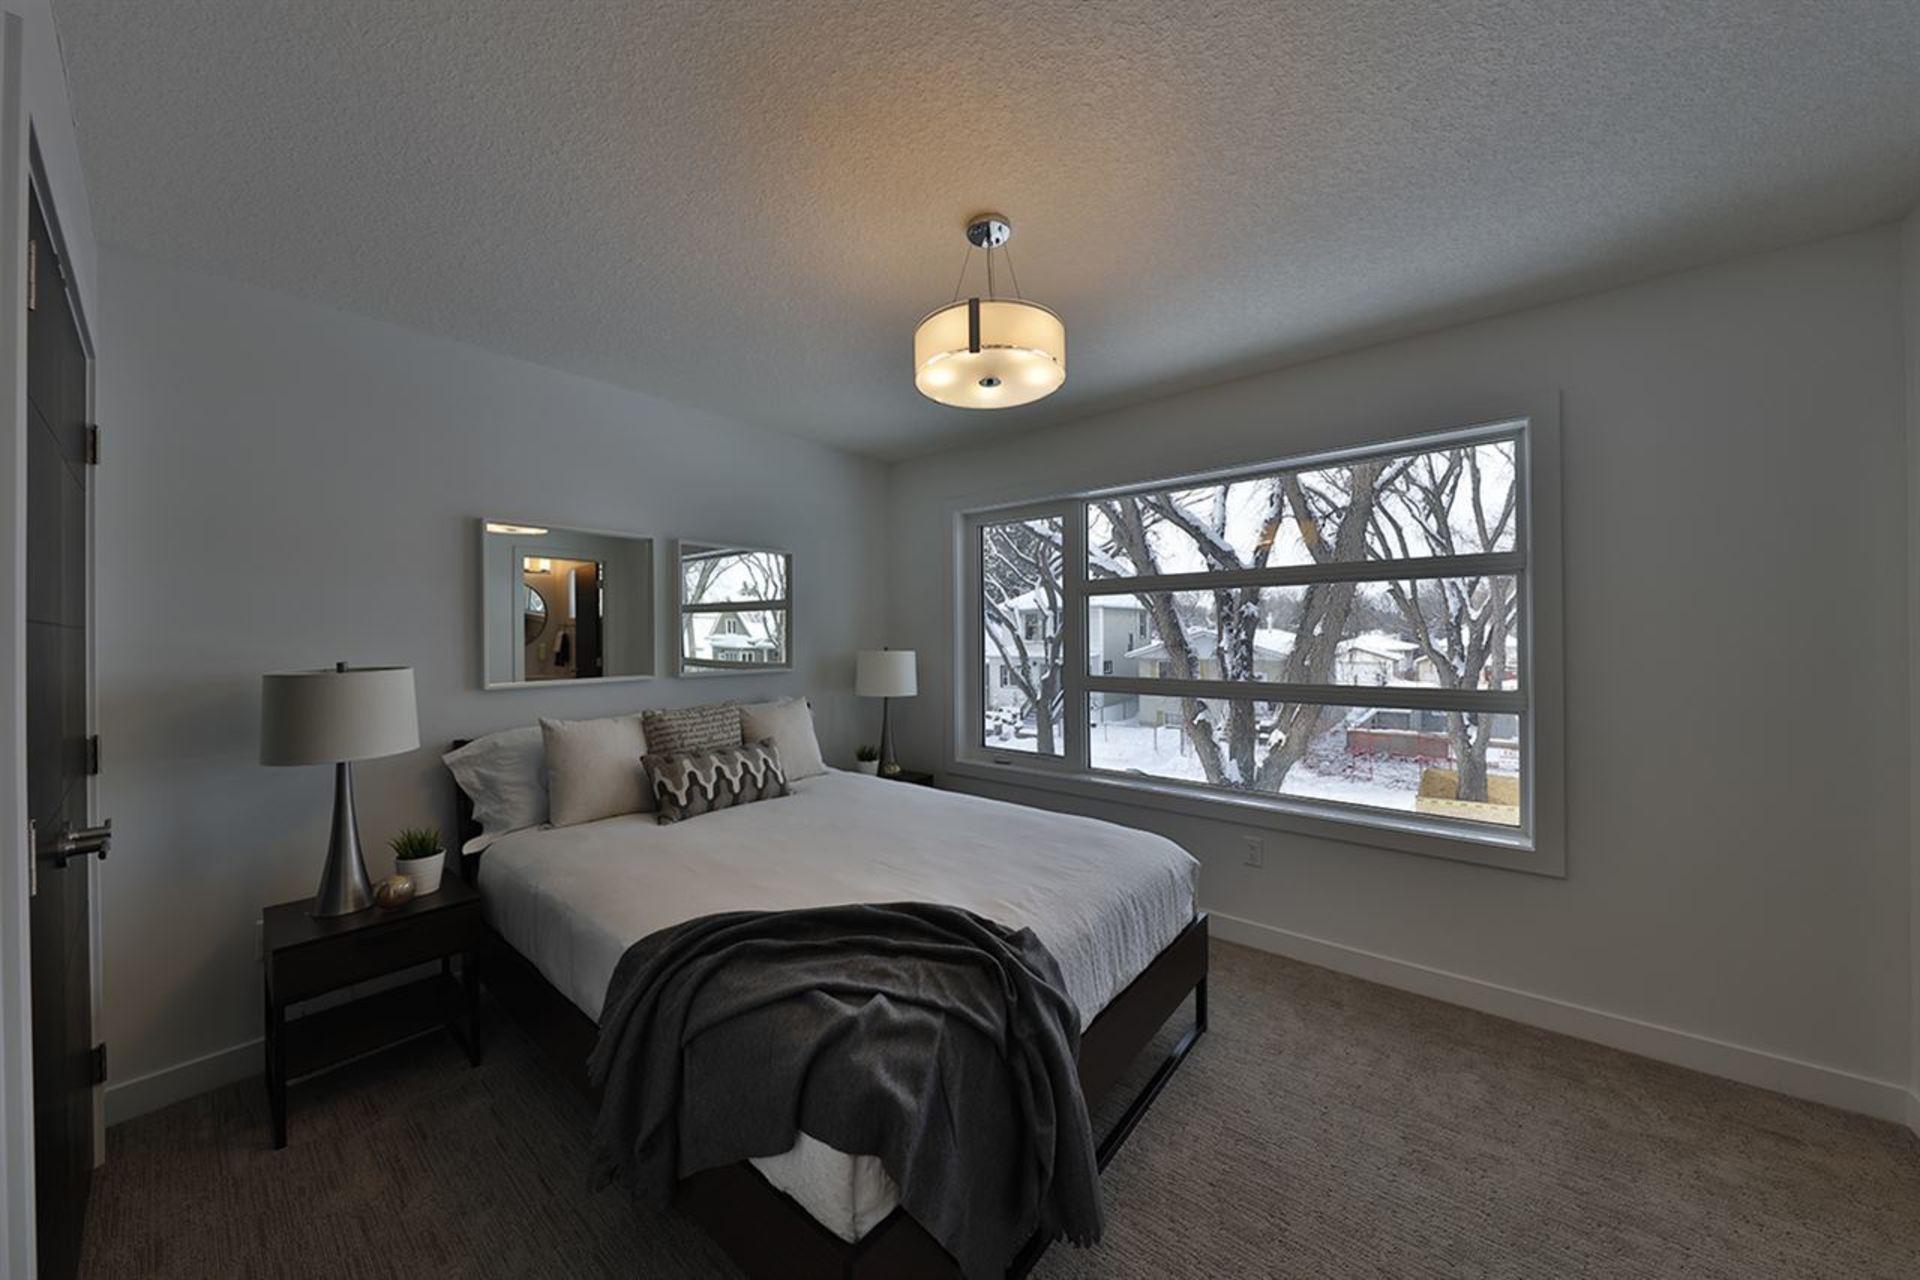 12037-93-street-alberta-avenue-edmonton-07 at 12037 93 Street, Alberta Avenue, Edmonton